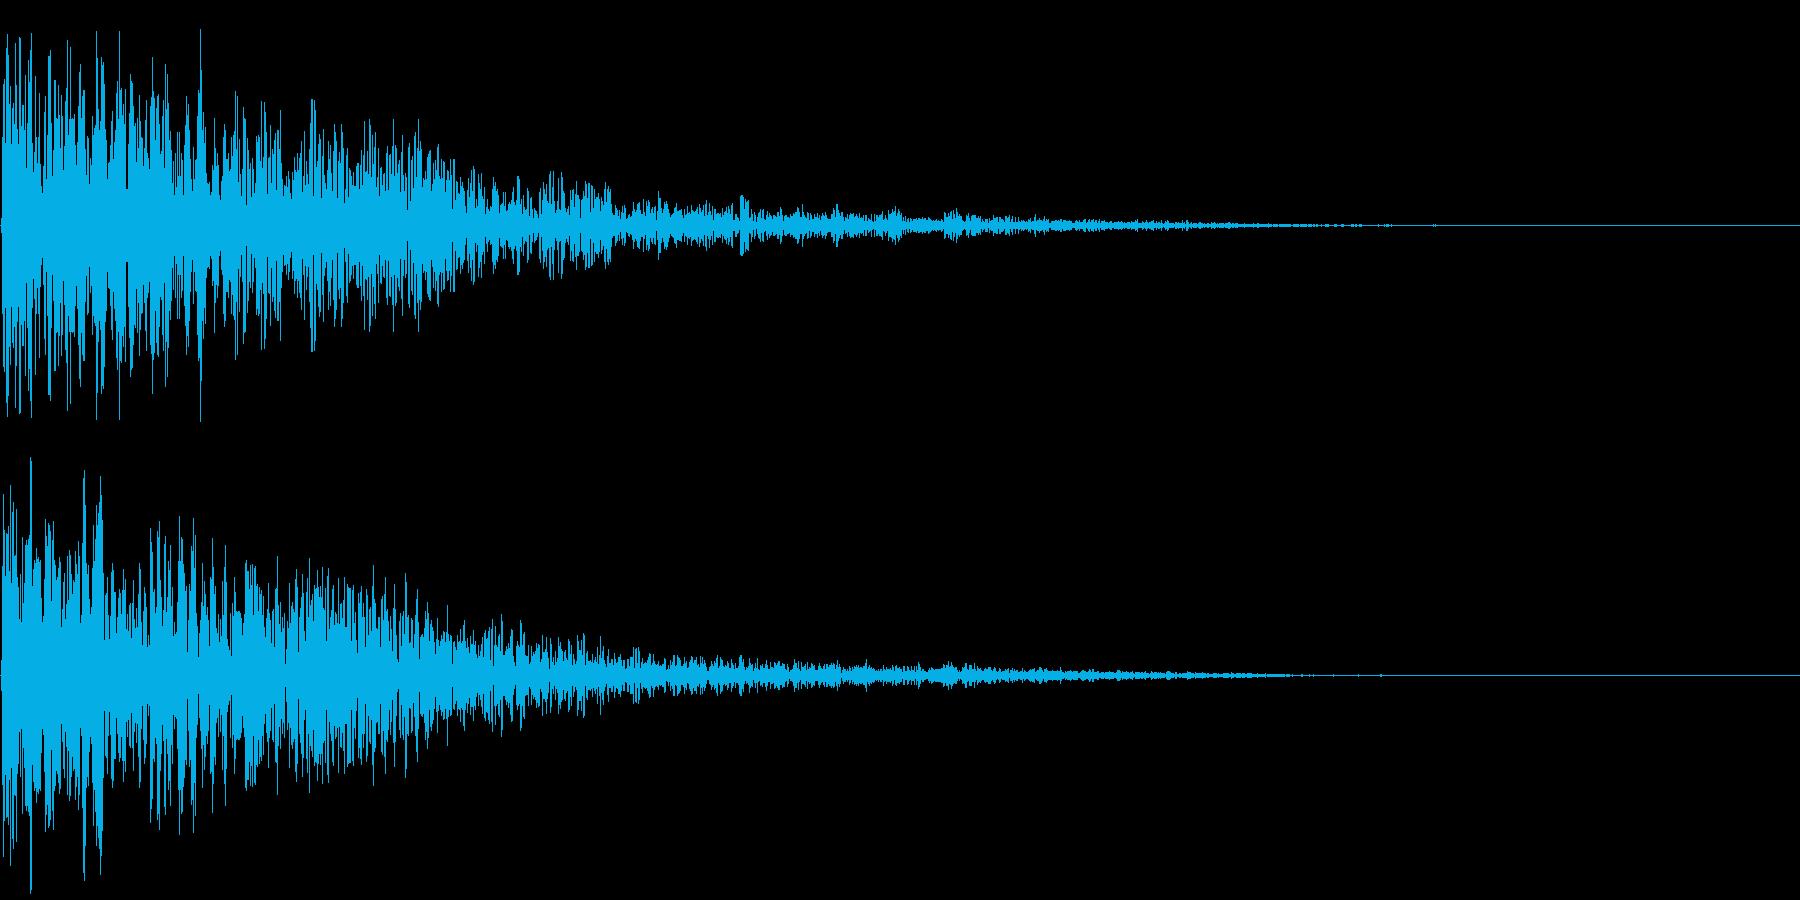 【SF映画演出】衝撃音 ドウーンッッの再生済みの波形